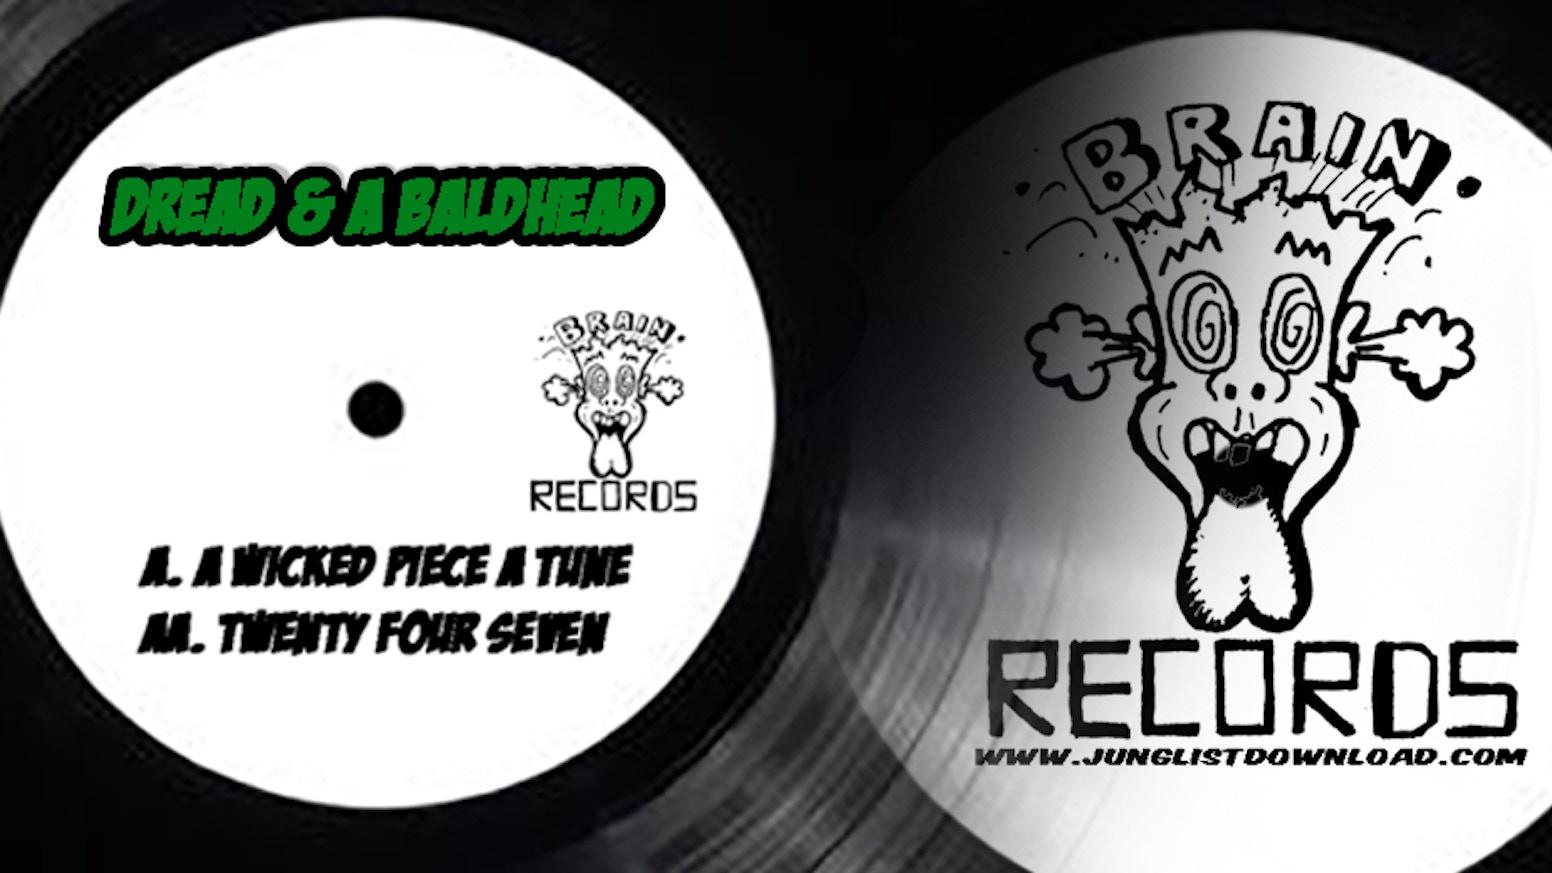 Vinyl Re Pressing of Our Junglist / Drum n bass Single.  Dread & a Baldhead 1. WICKED PIECE A TUNE 2. Twenty Four Seven